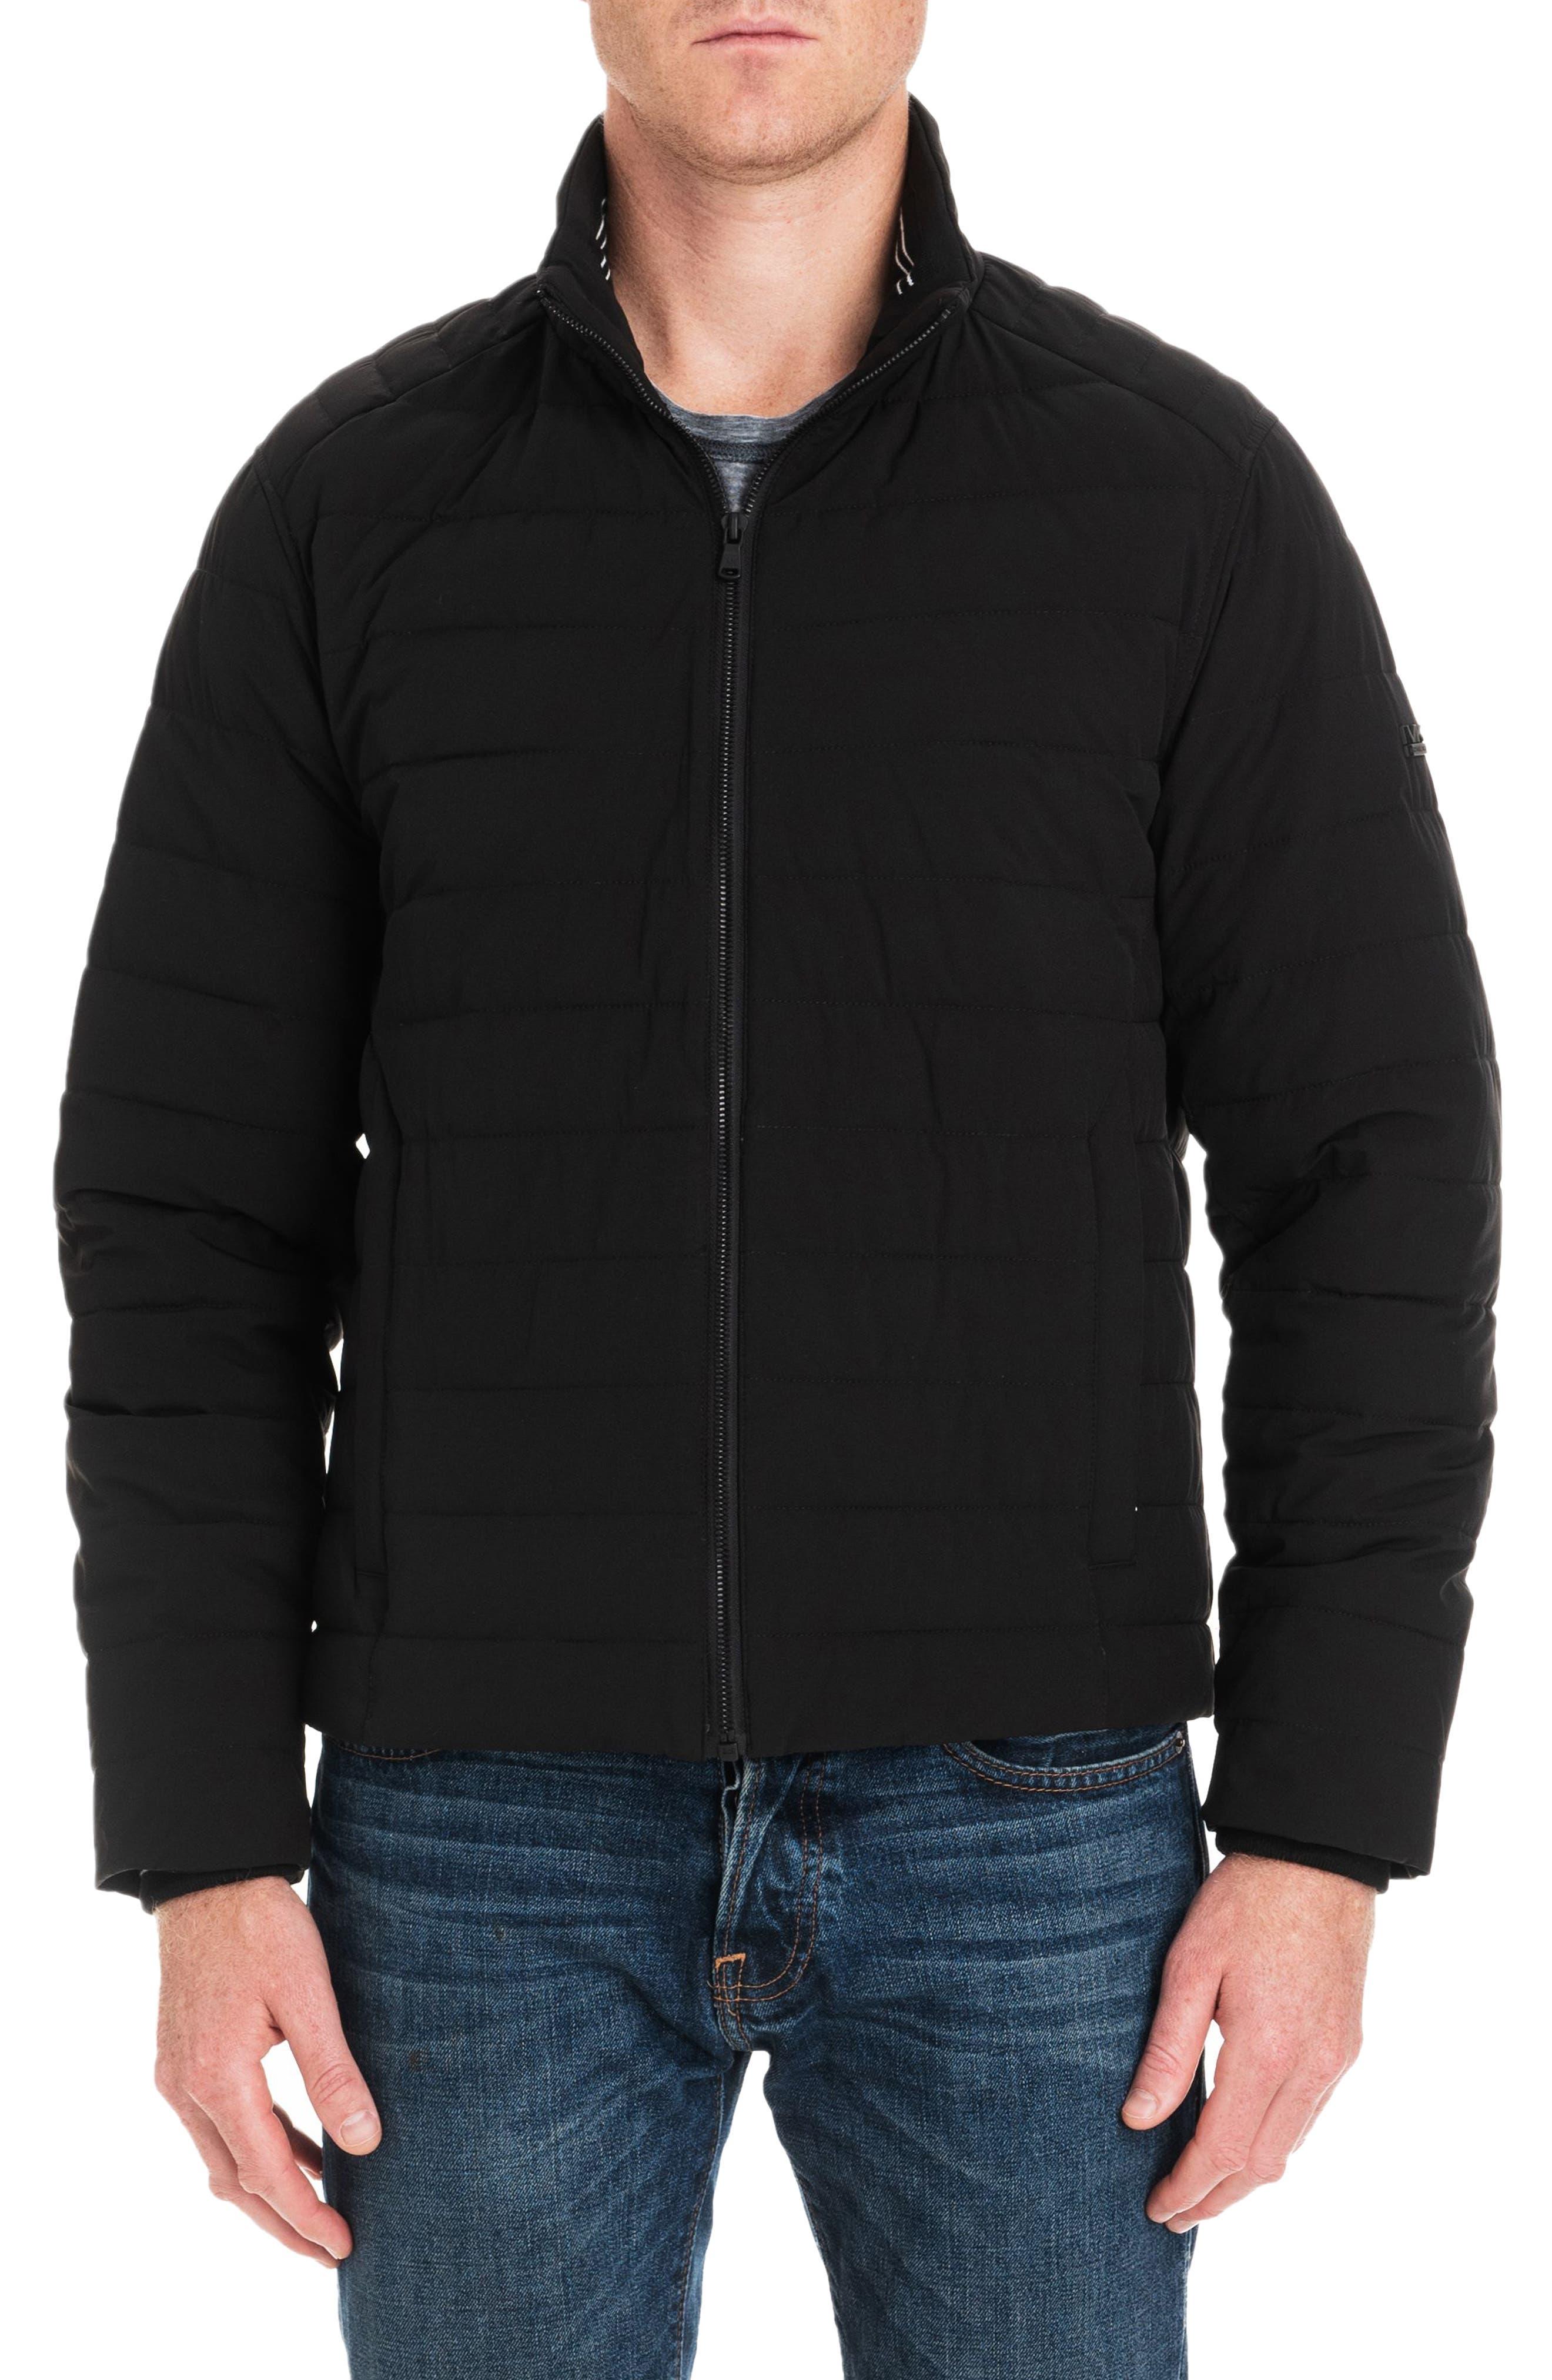 Michael Kors Fulton Quilted Jacket, Black